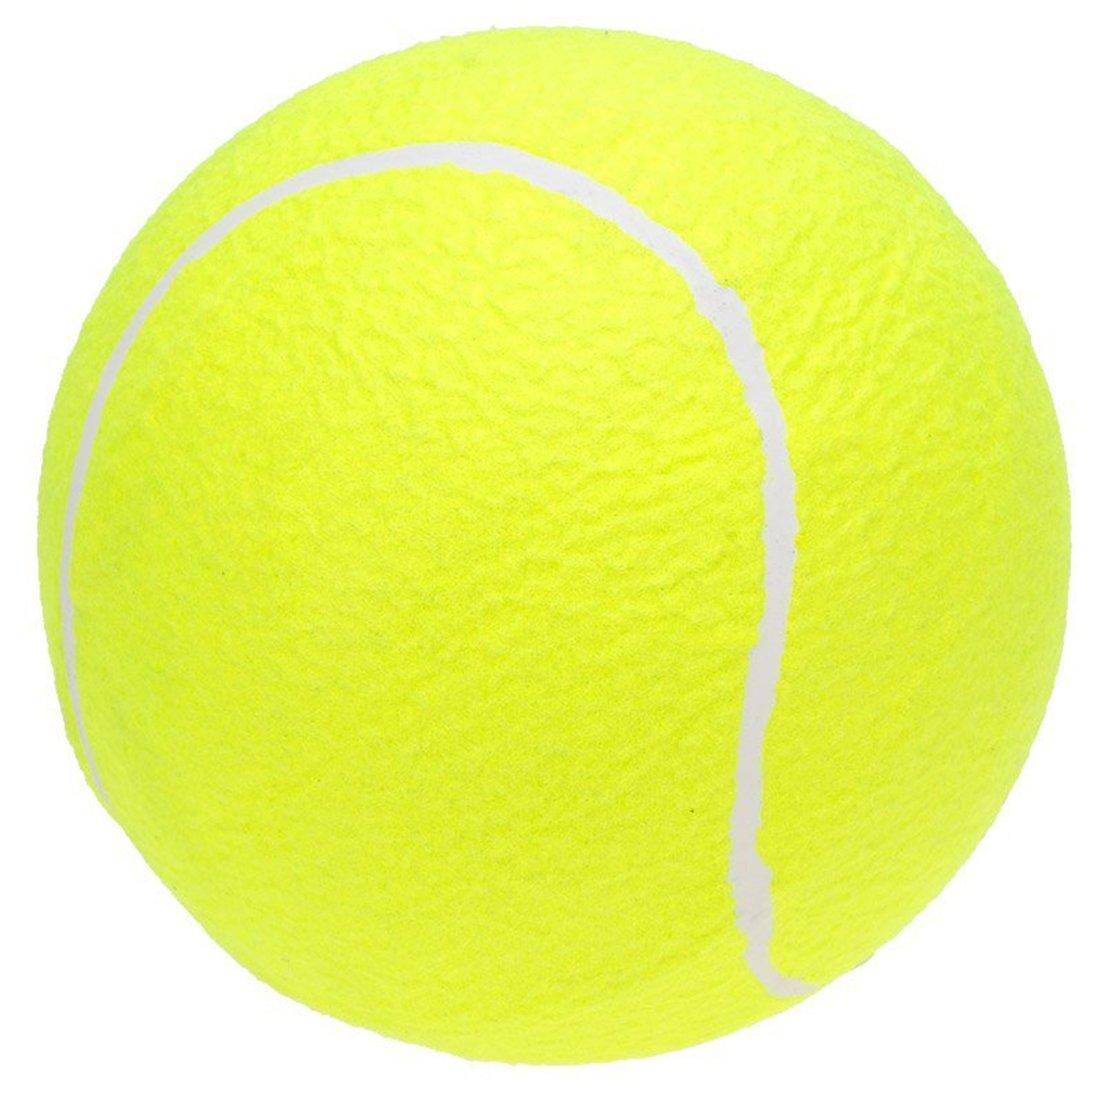 SODIAL 9.5 Oversize Giant Tennis Ball for Children Adult Pet Fun R Giant Tennis Ball